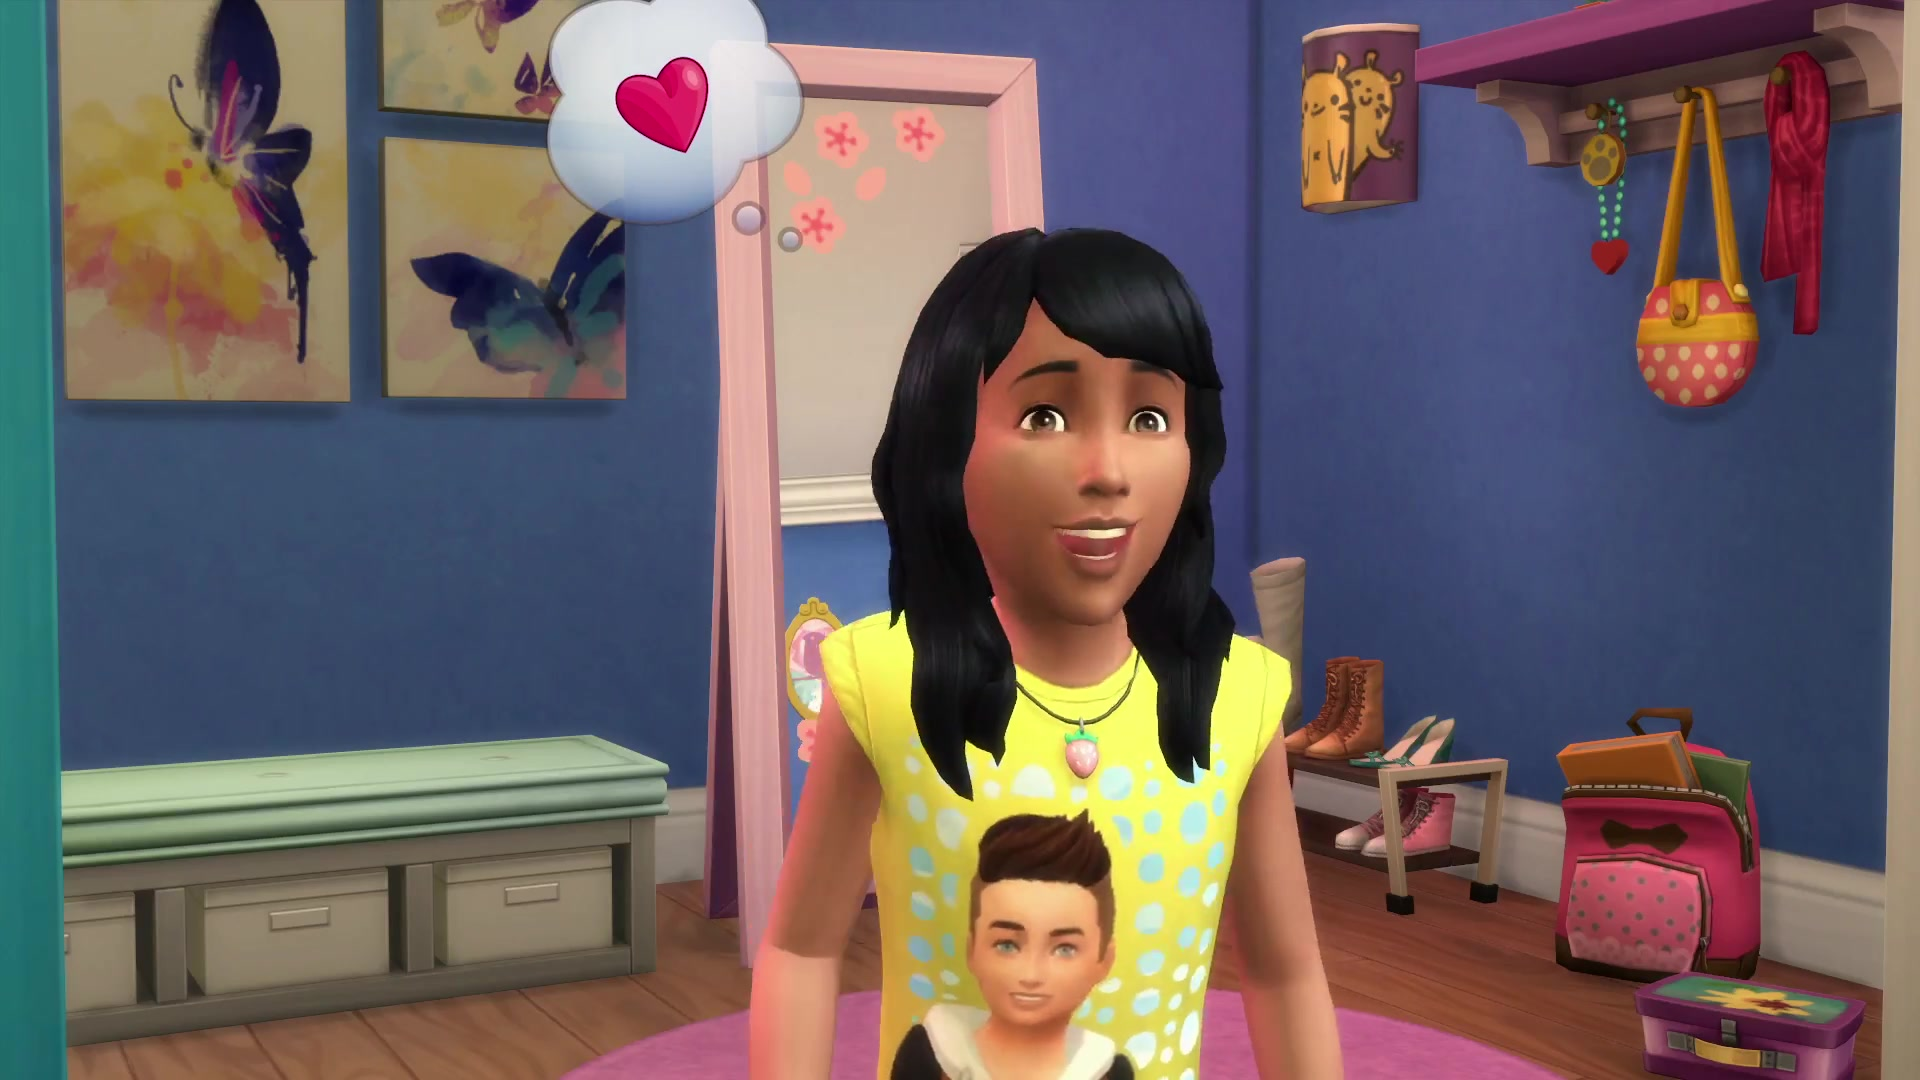 The Sims 4 Kids Room Stuff: New Render | SimsVIP